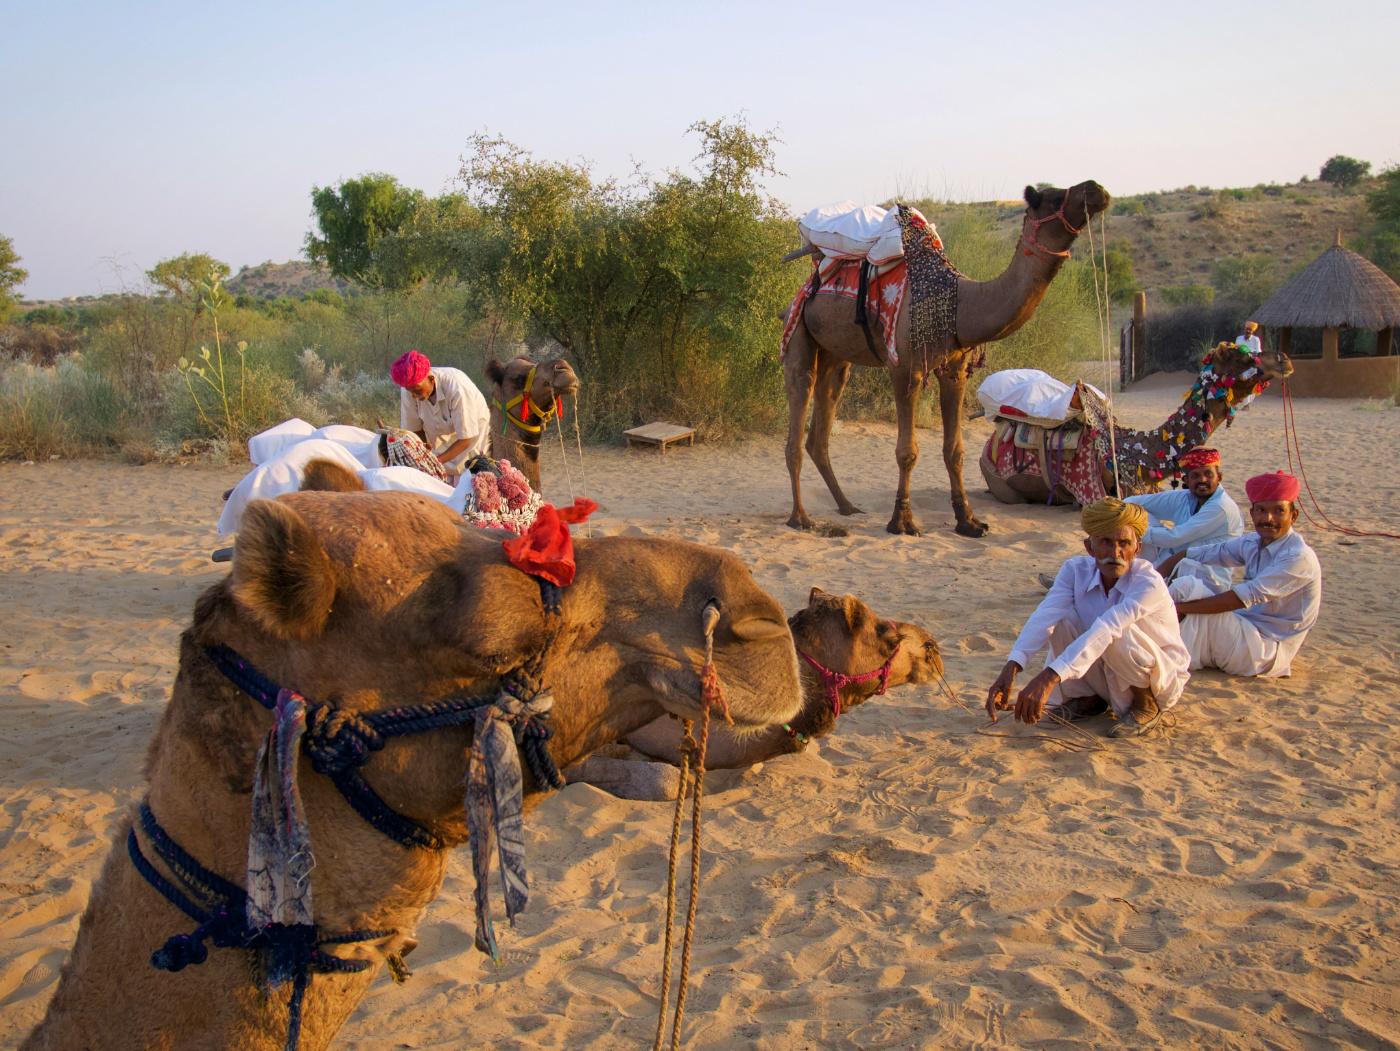 487-India-TharDesert